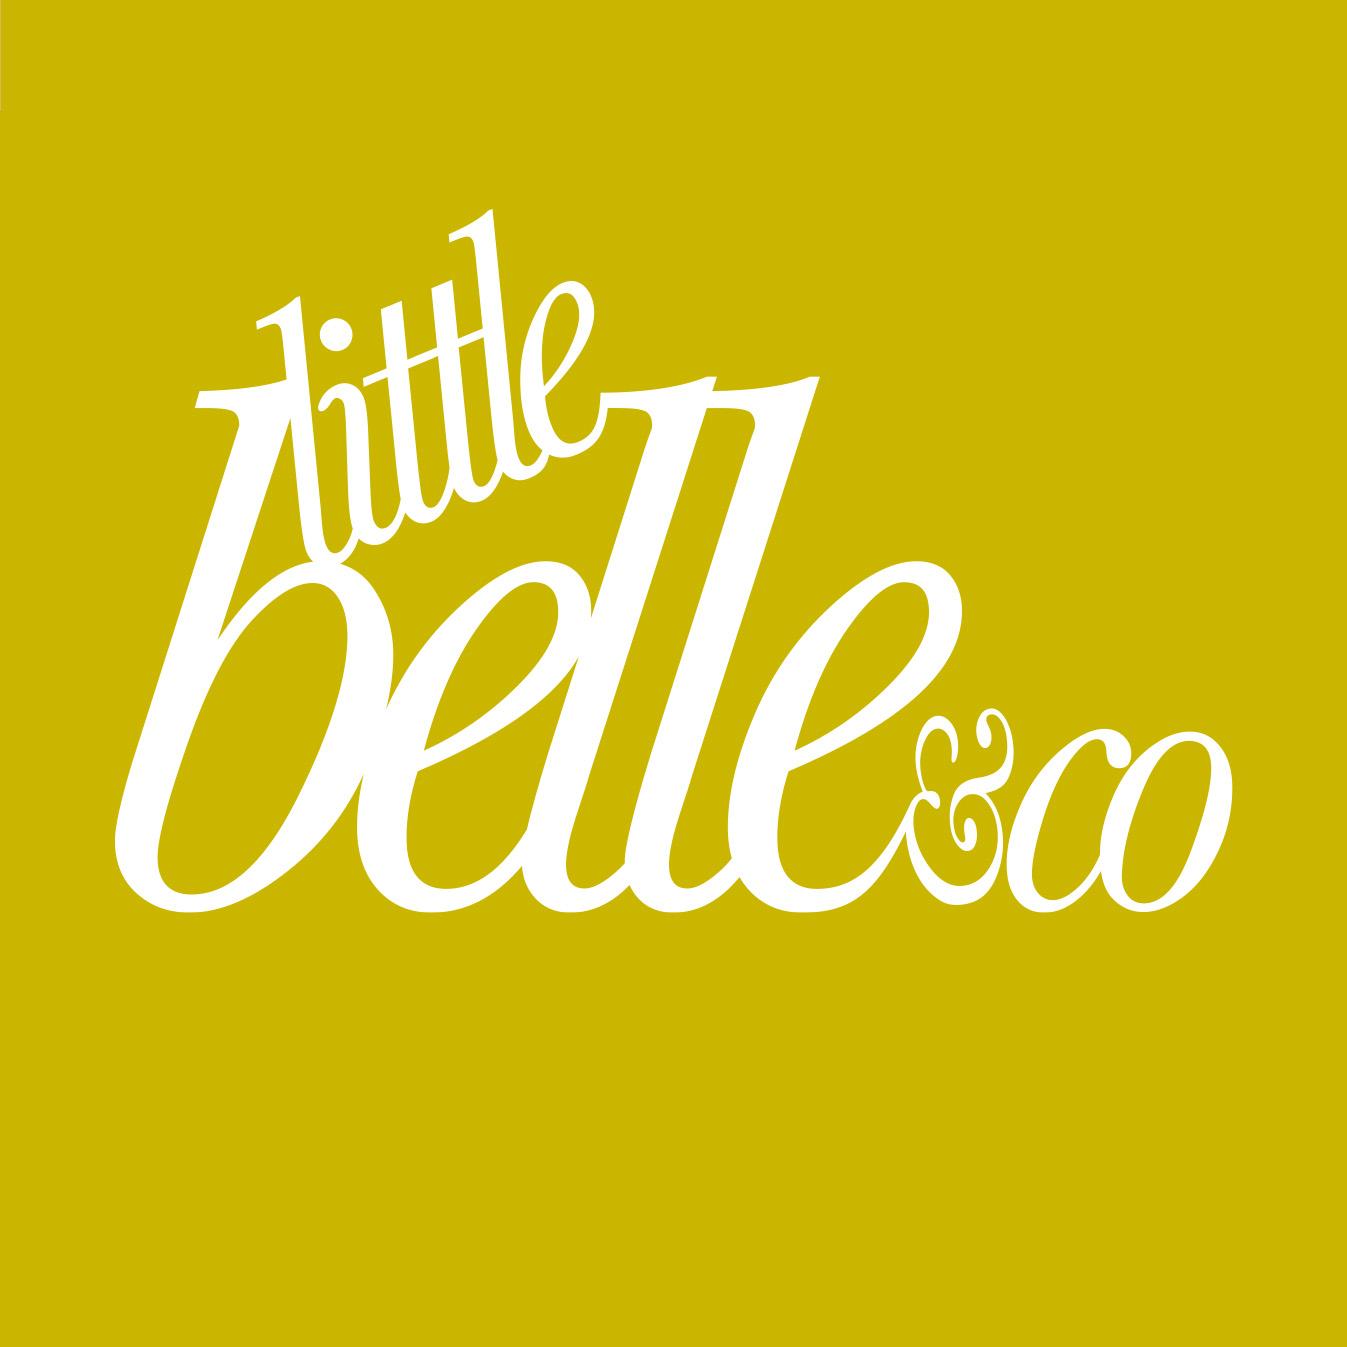 Littlebelleandco